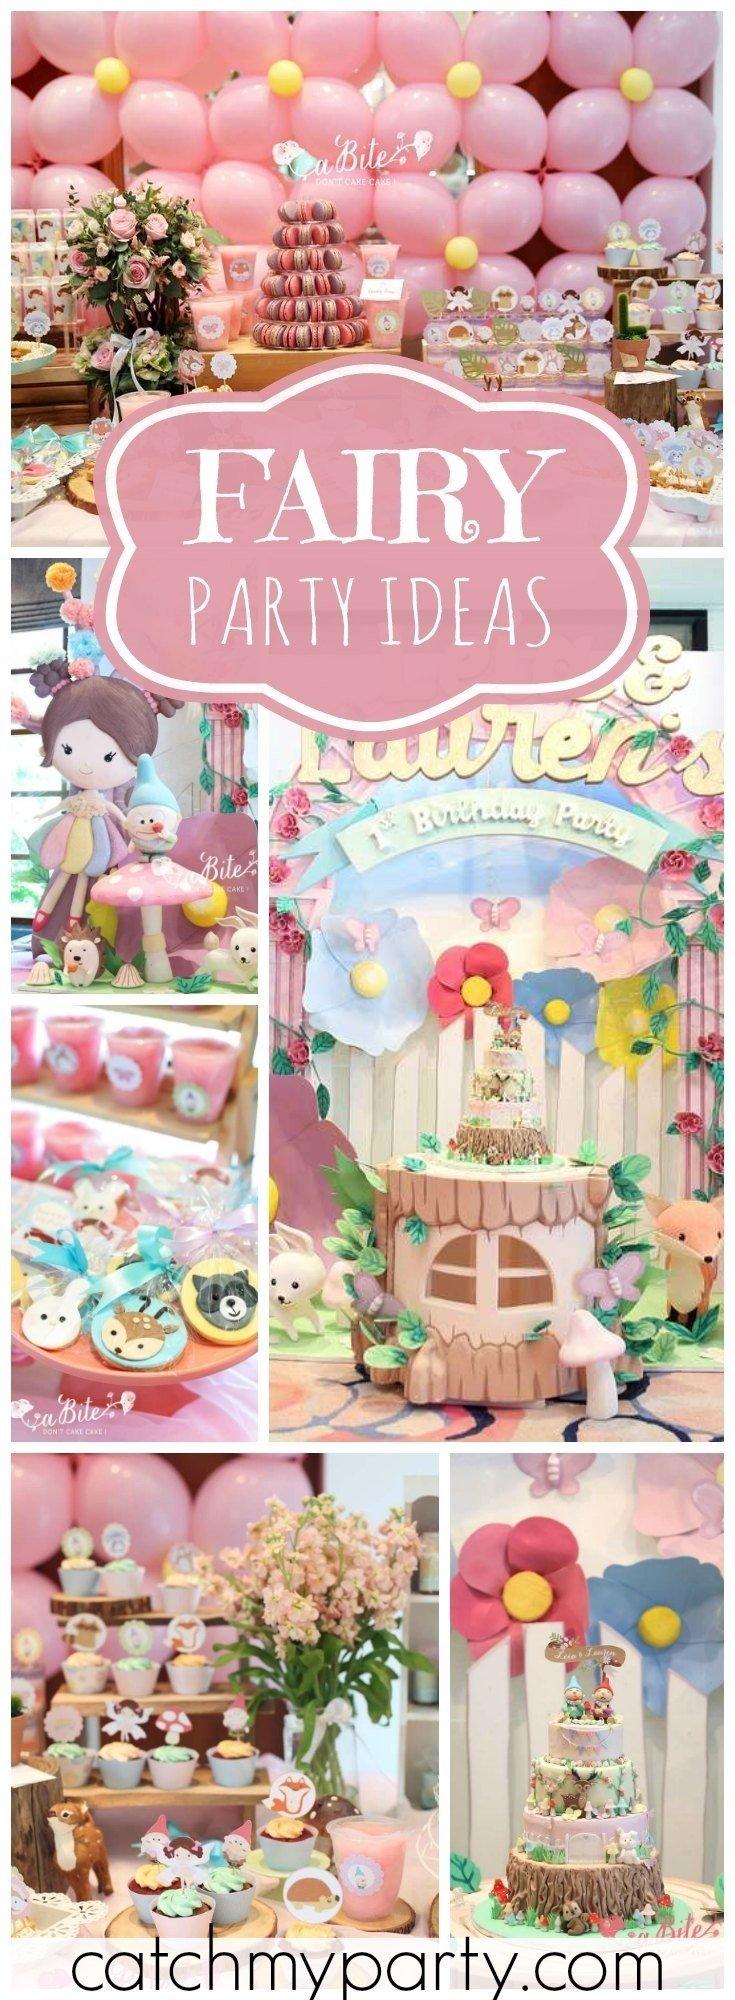 10 Fashionable 5Th Birthday Party Ideas For Girls fairy birthday leia laurens fairy garden girl birthday 2020